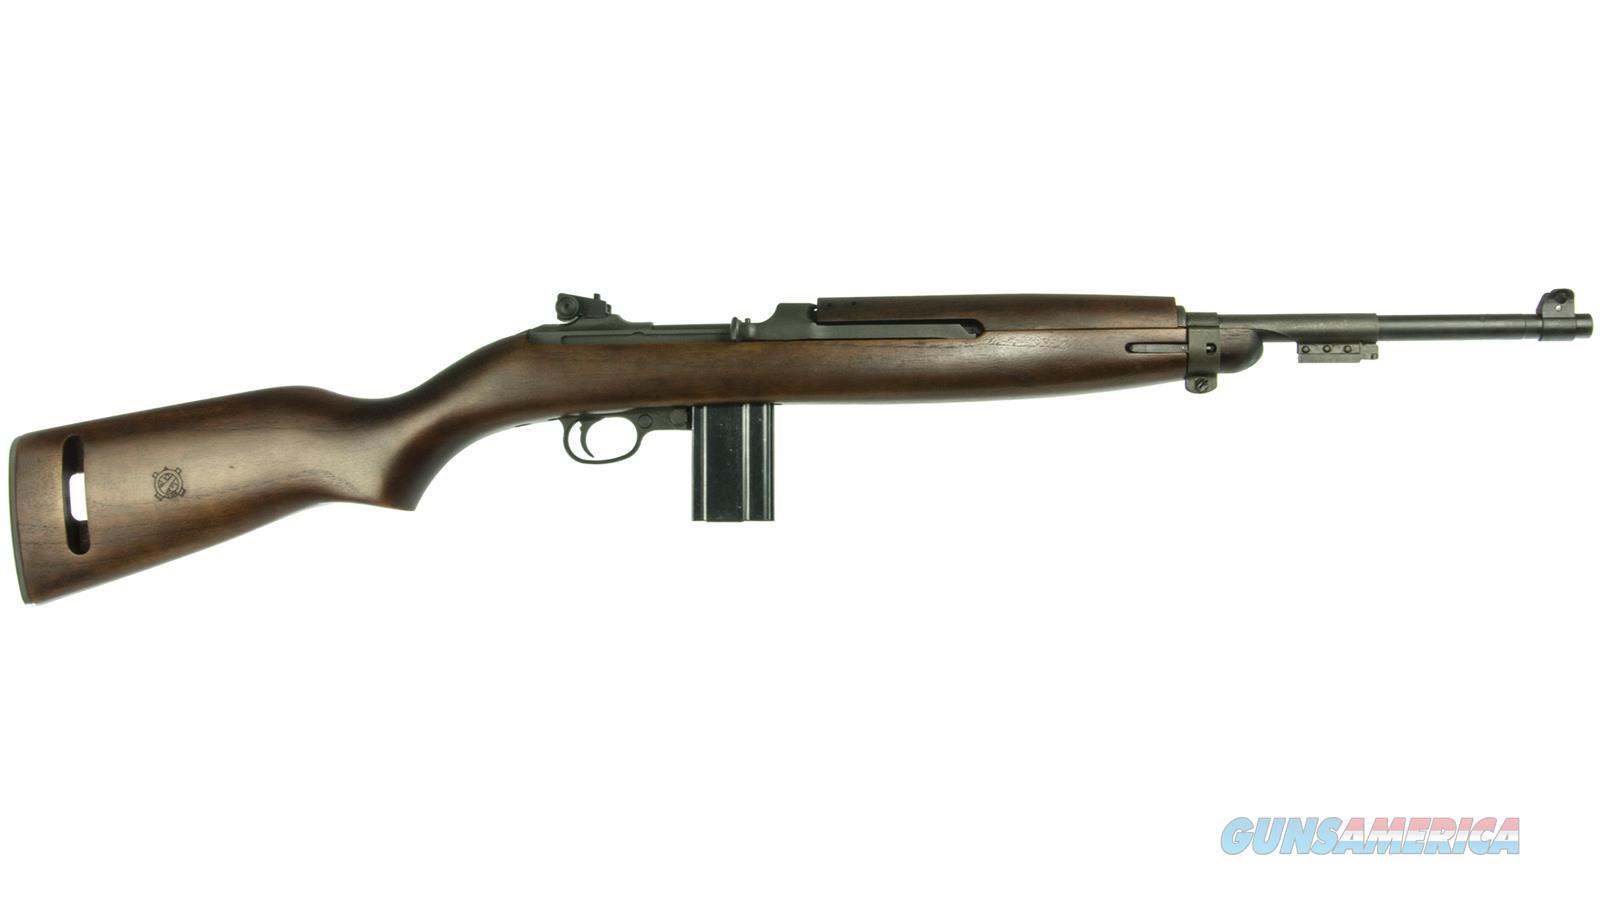 Mks Supply M1 Carbine 1945 Model .30 Carbine 15Rd Parkerized ILM130  Guns > Rifles > MN Misc Rifles